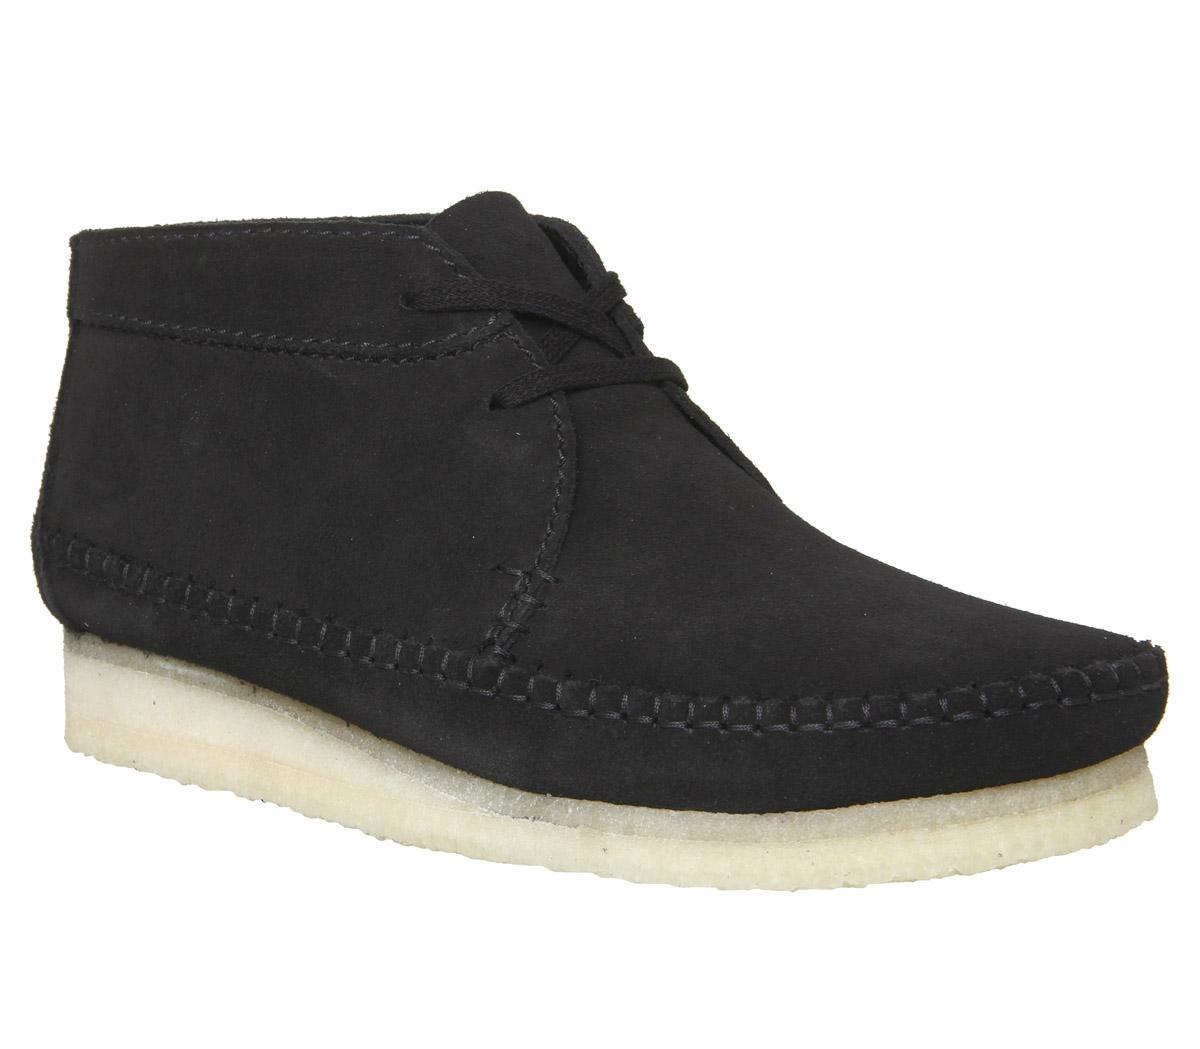 mostaza Muslo izquierda  Clarks Originals Weaver Boot Black Suede New - Boots